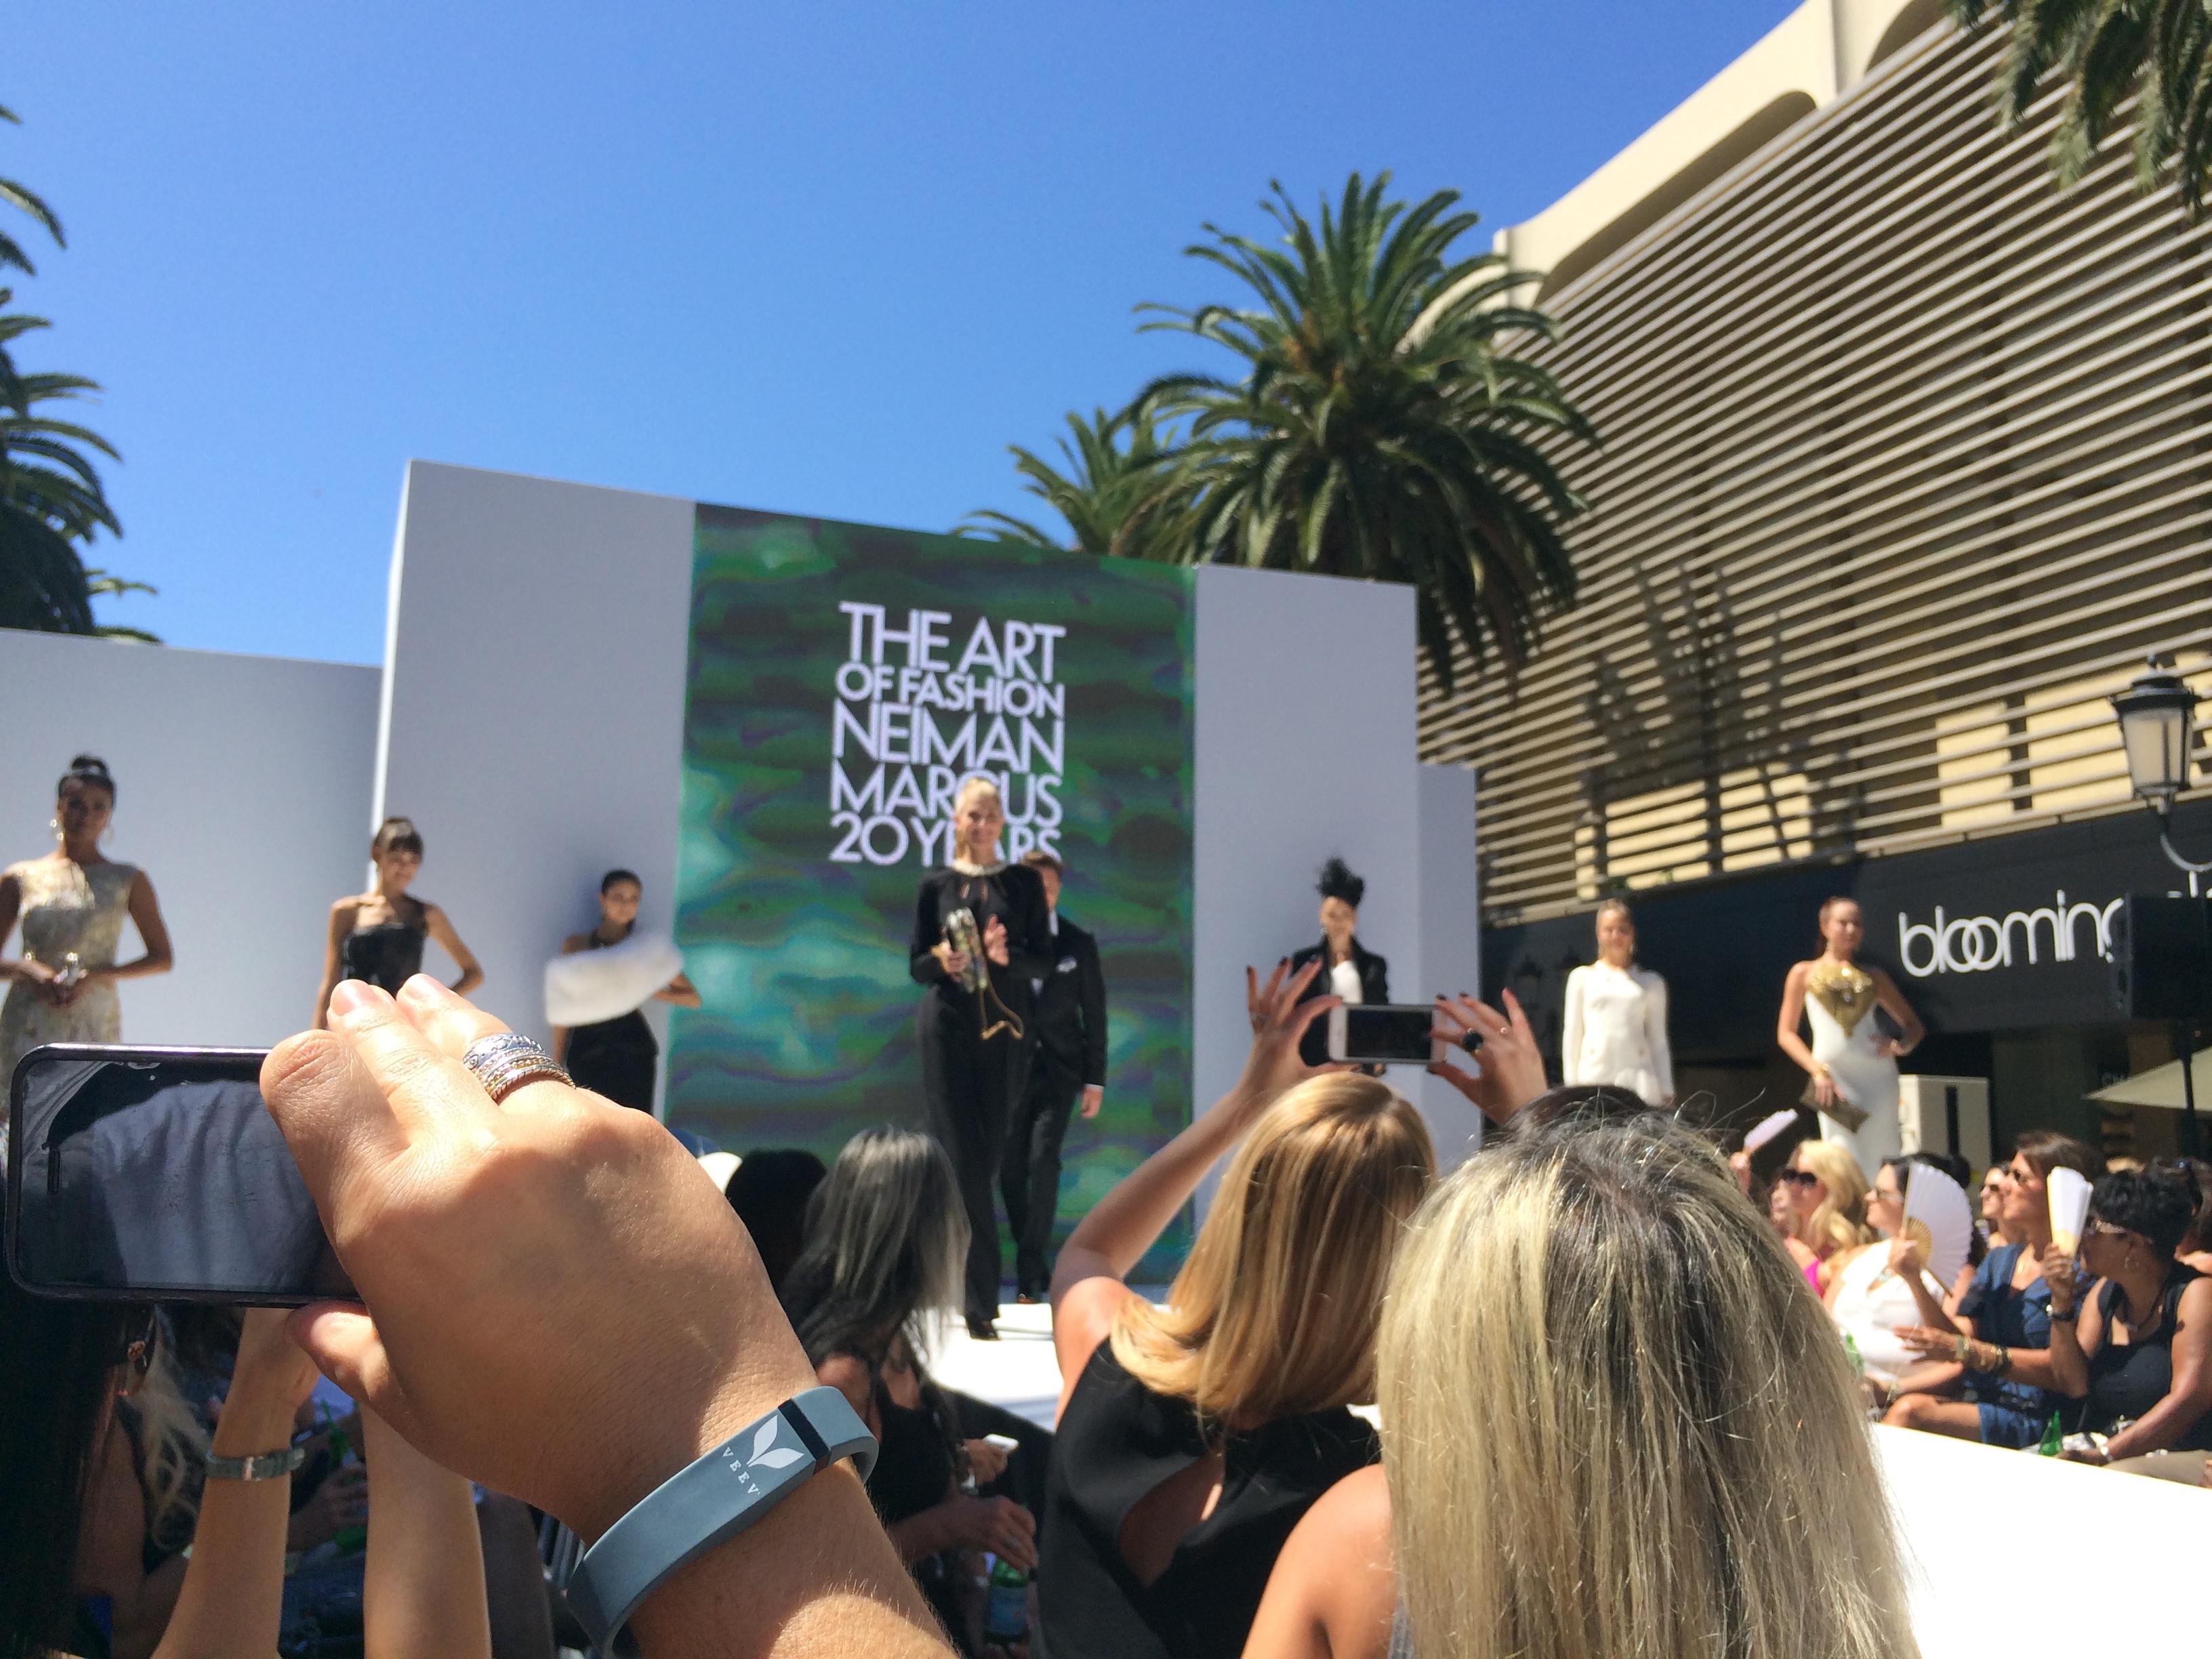 Neiman Marcus Art of Fashion show